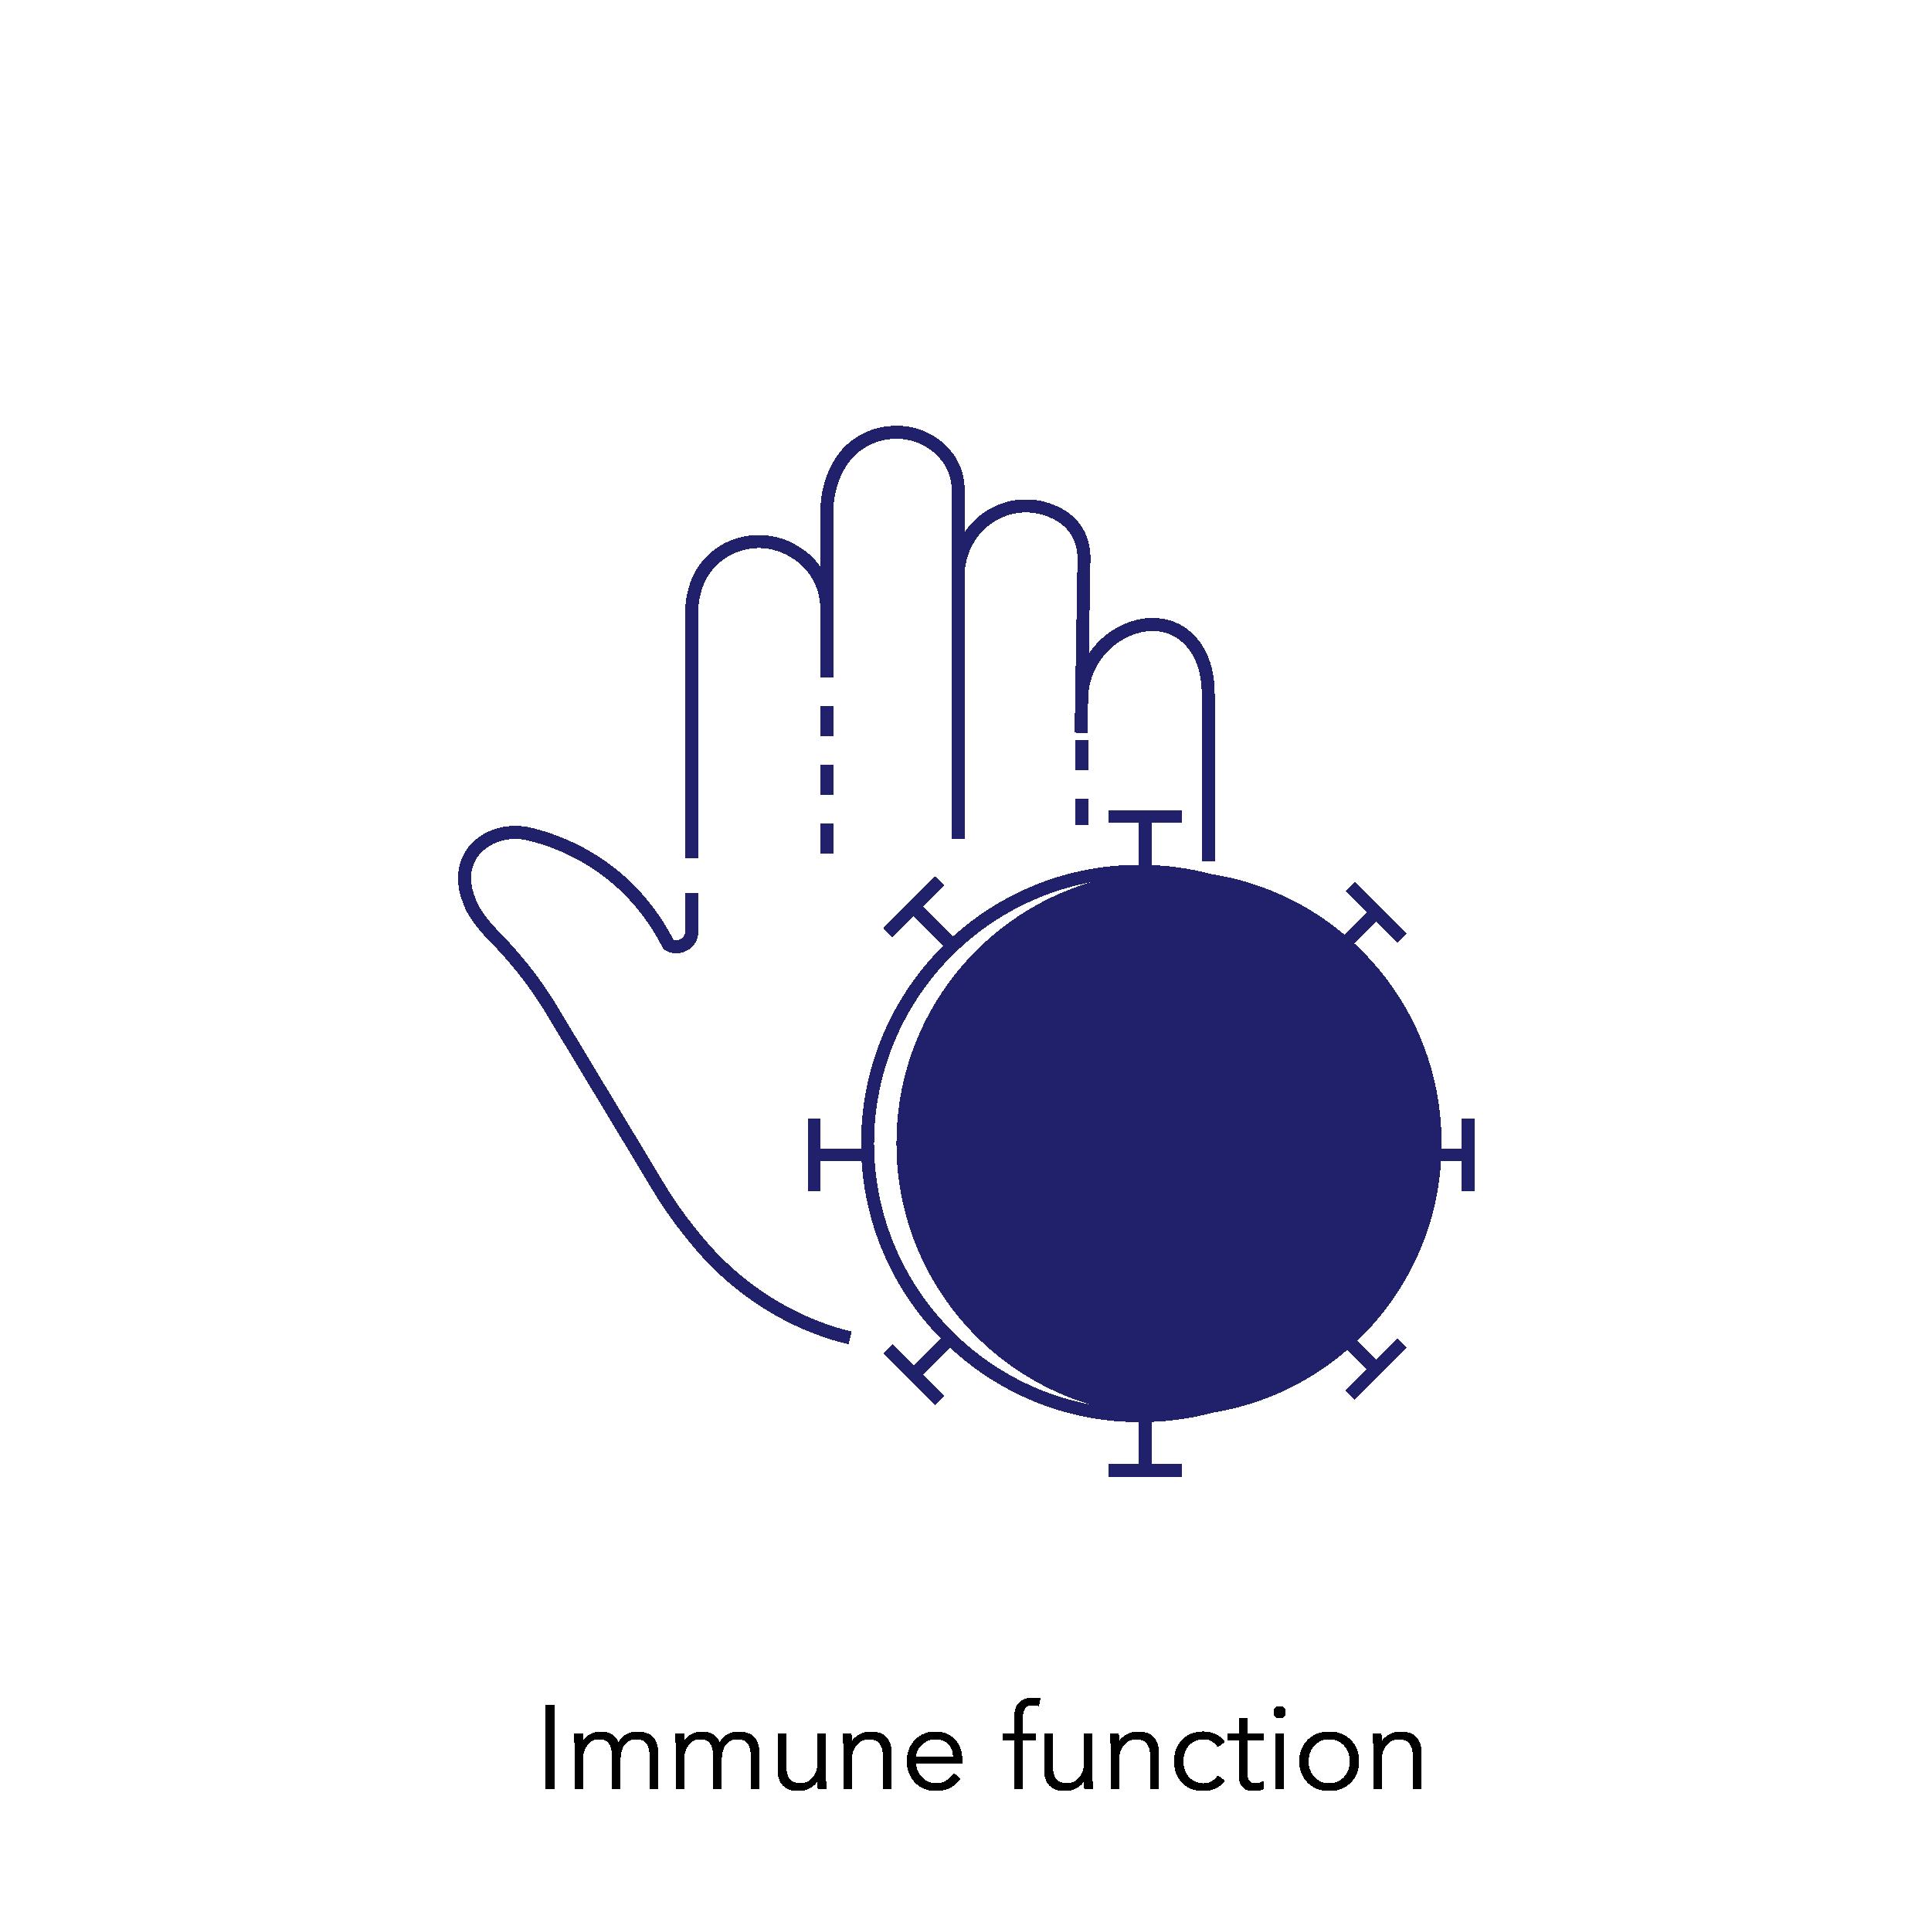 Immune function icon